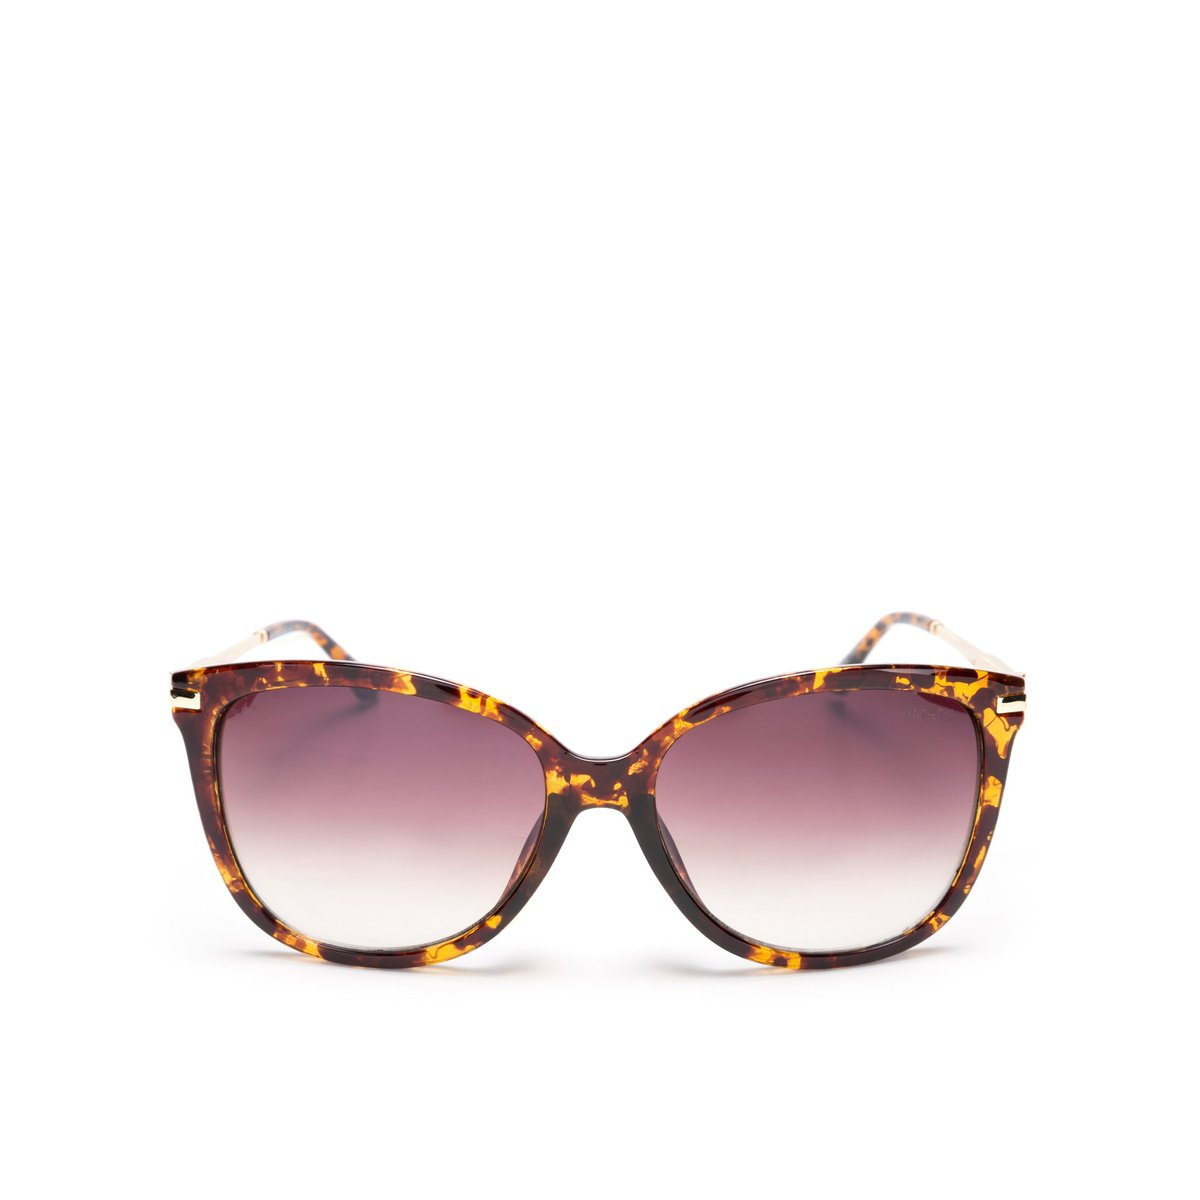 4e5b4be647d7c Óculos Amaro De Sol Beauty - Compre Agora